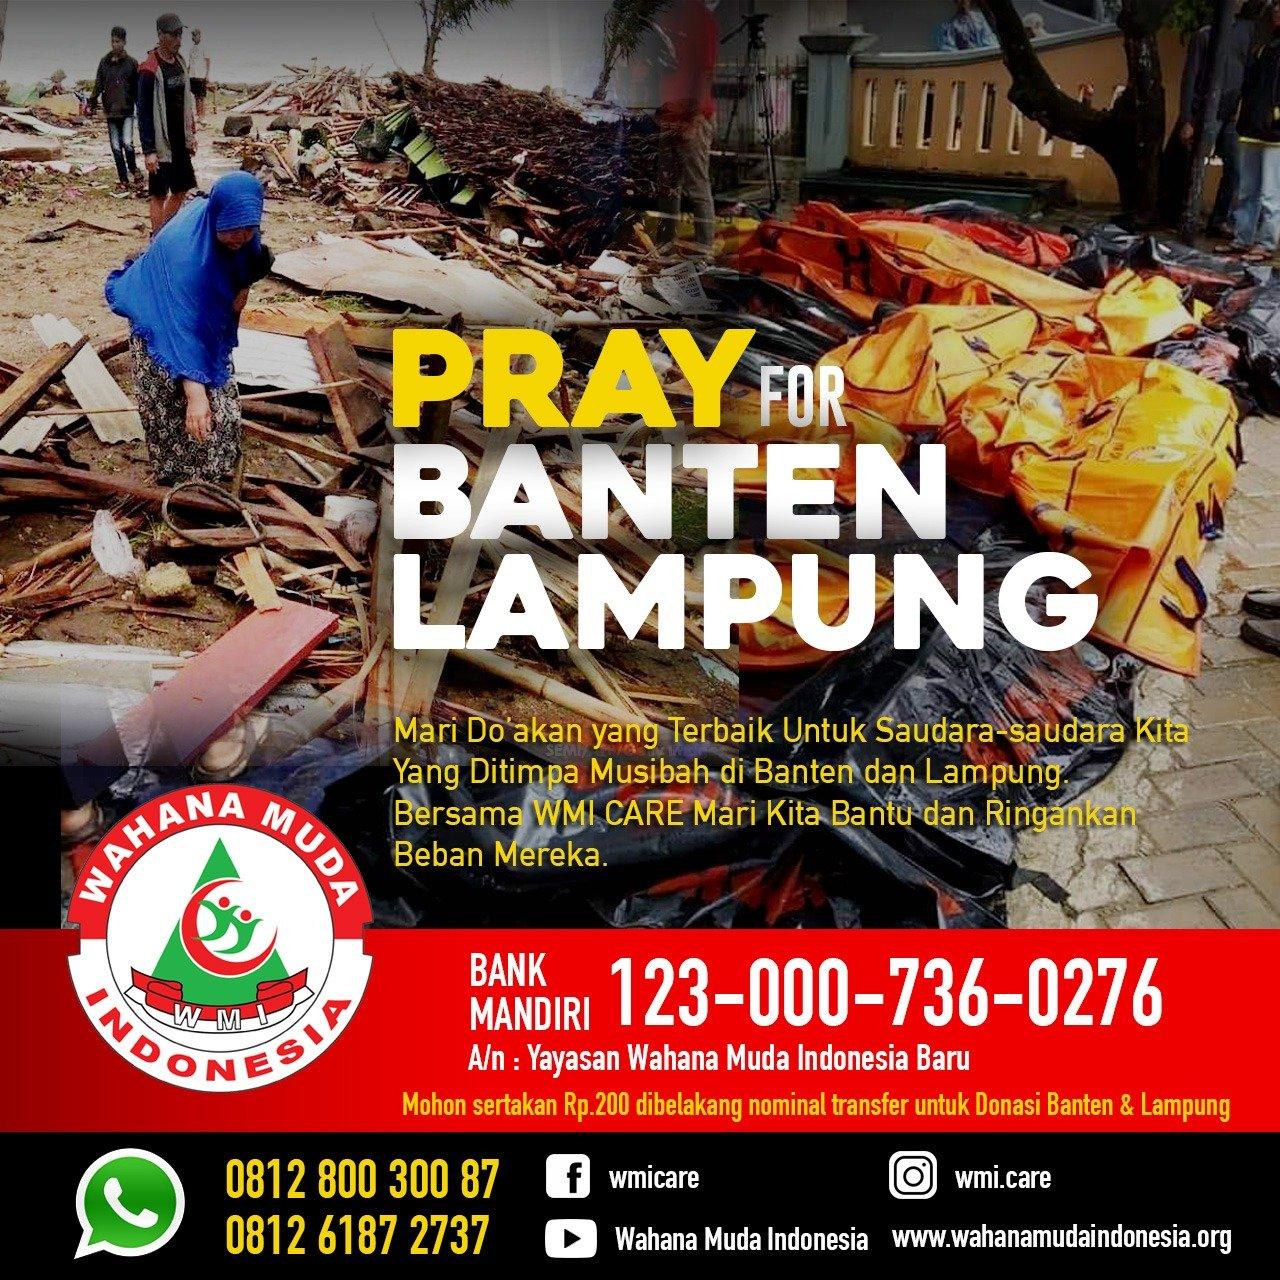 WMI Galang Donasi untuk Korban Tsunami Banten dan Lampung